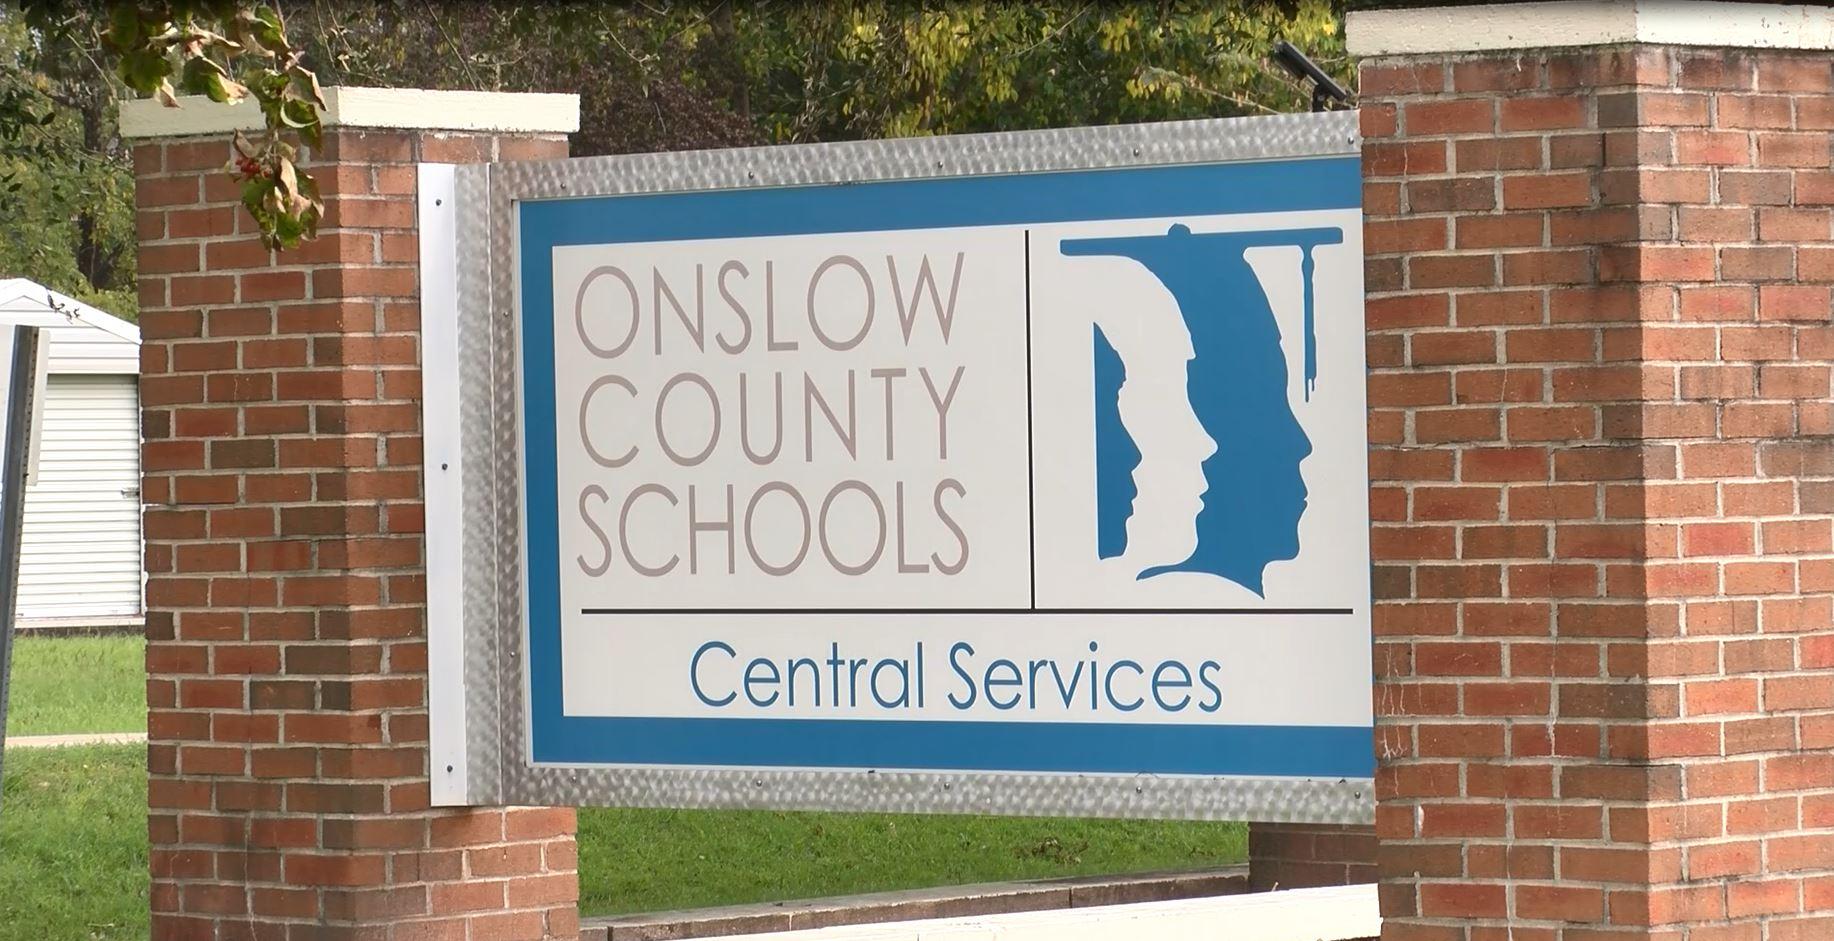 onslow county schools central_1537911916820.JPG.jpg